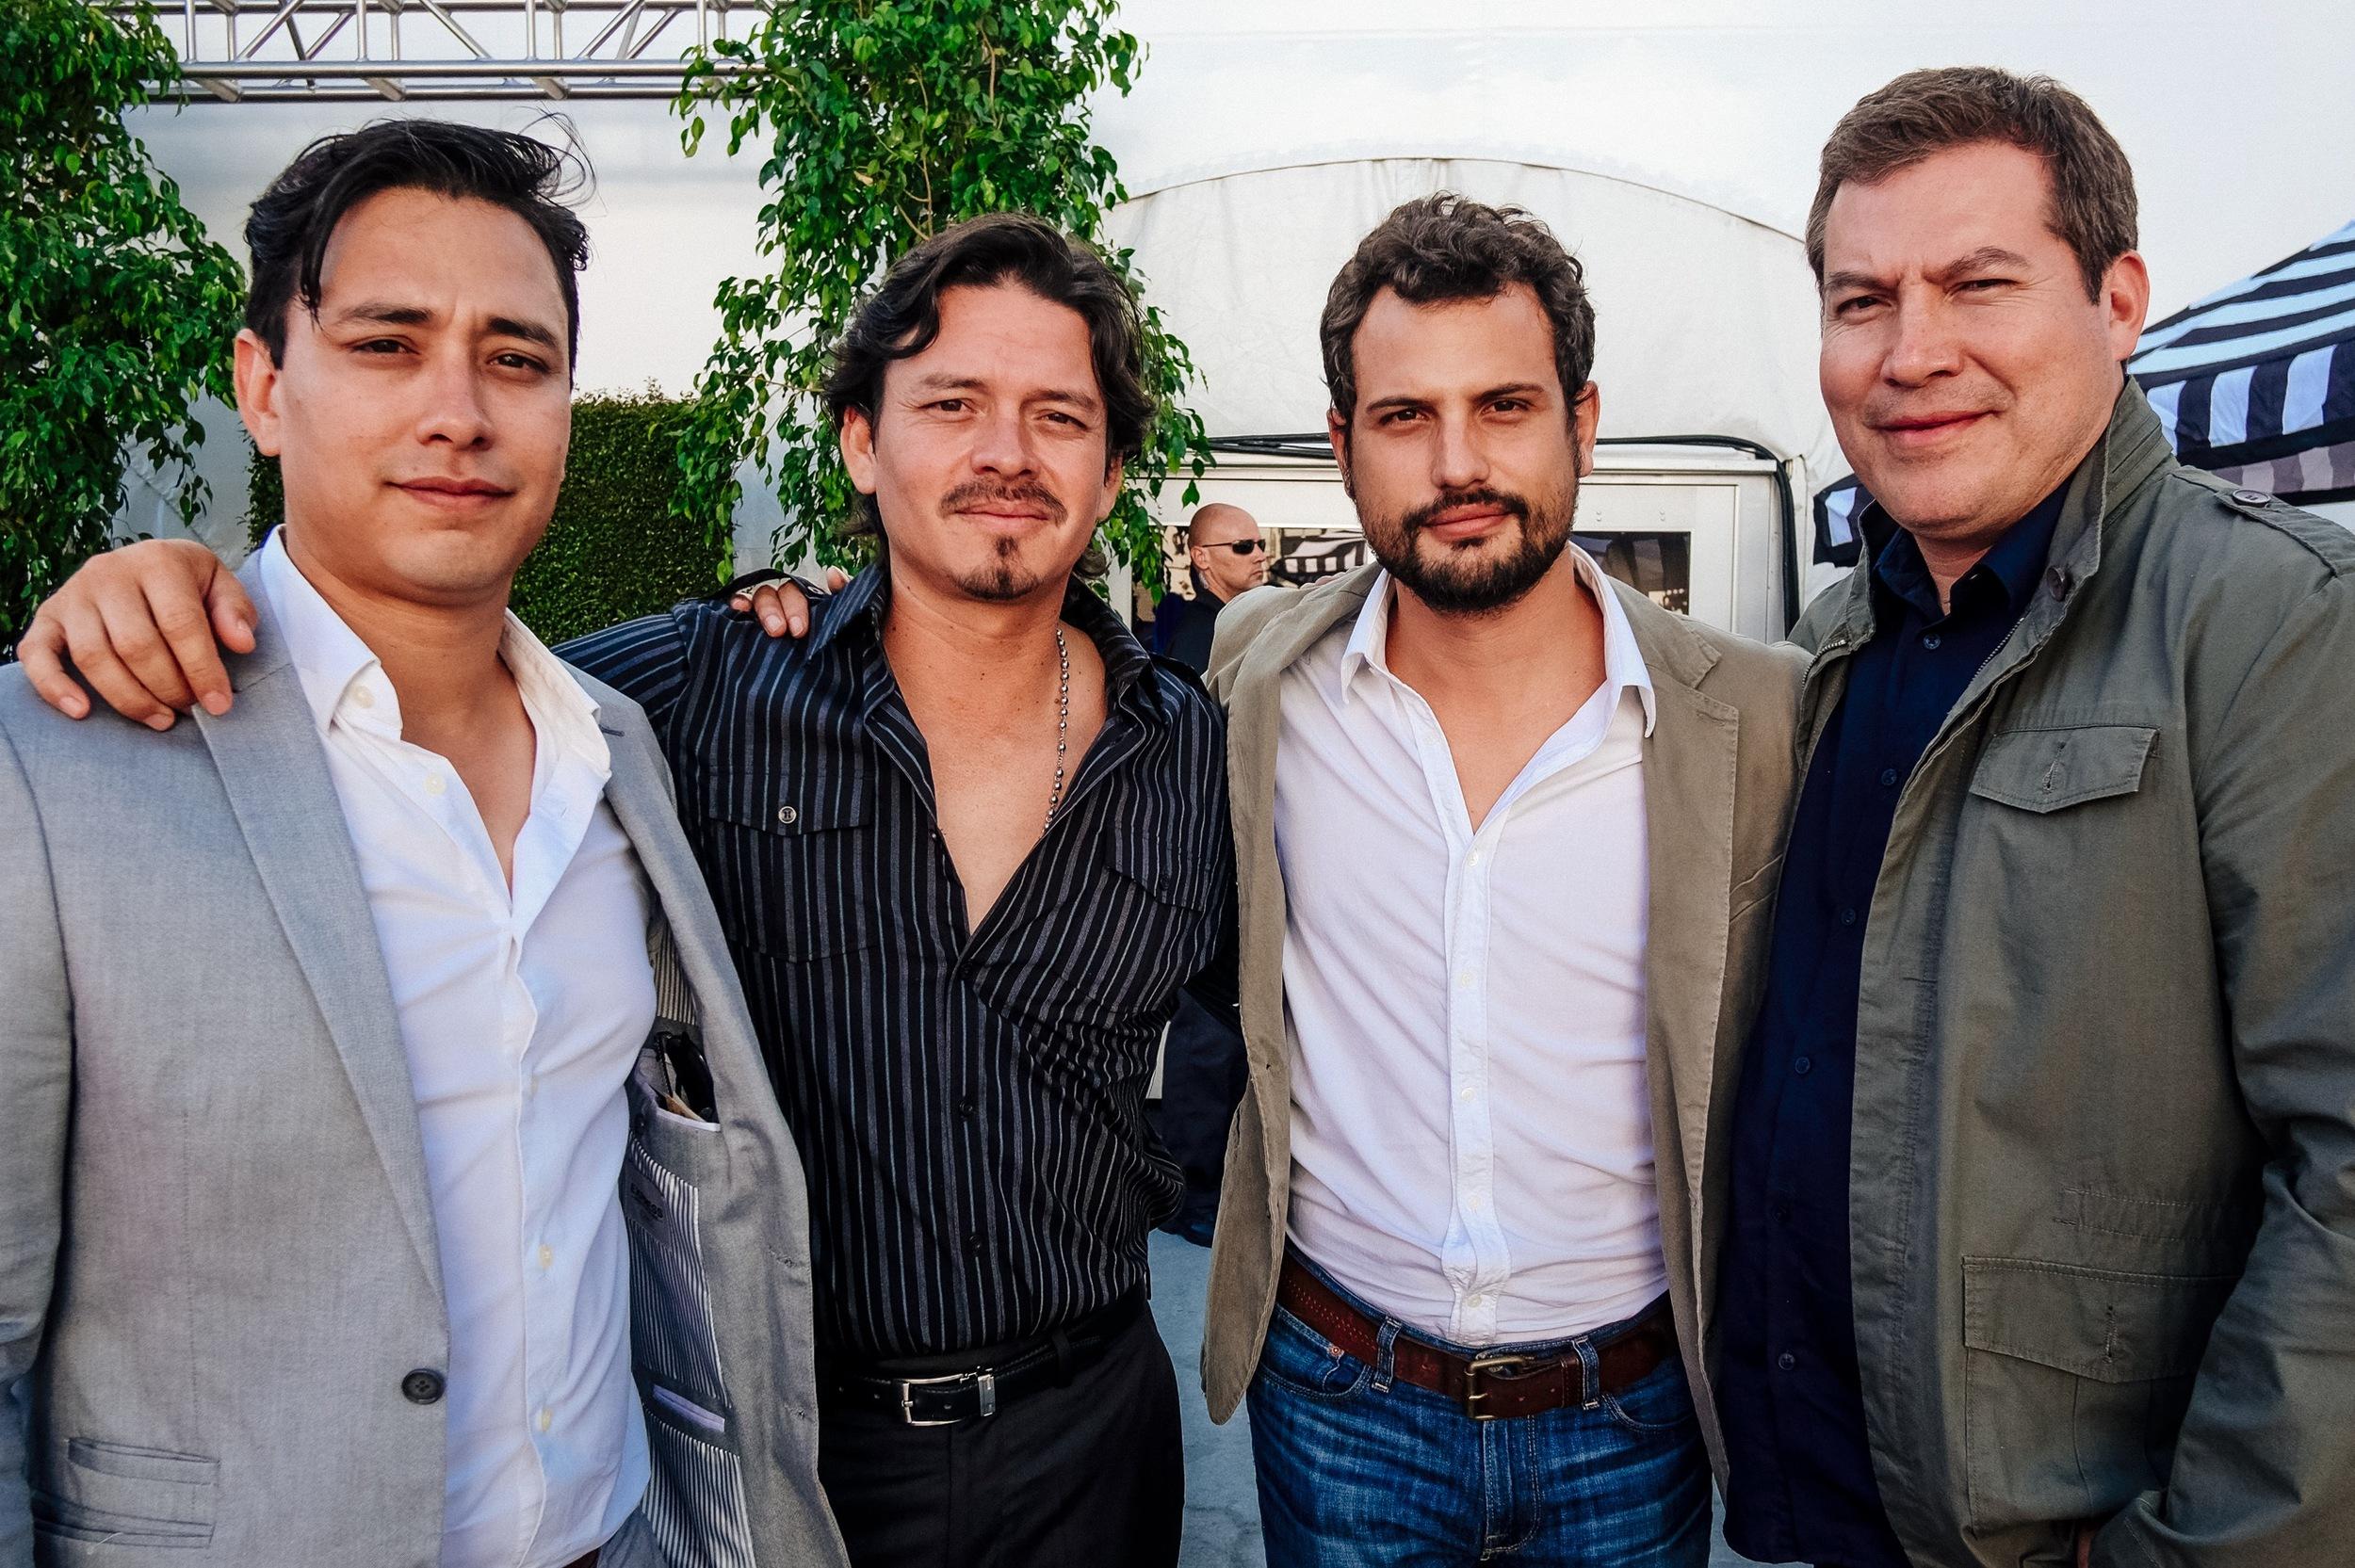 Jaime Jimenez, Jorge A. Jimenez, Roberto Urbina, and Julio César Cedillo.